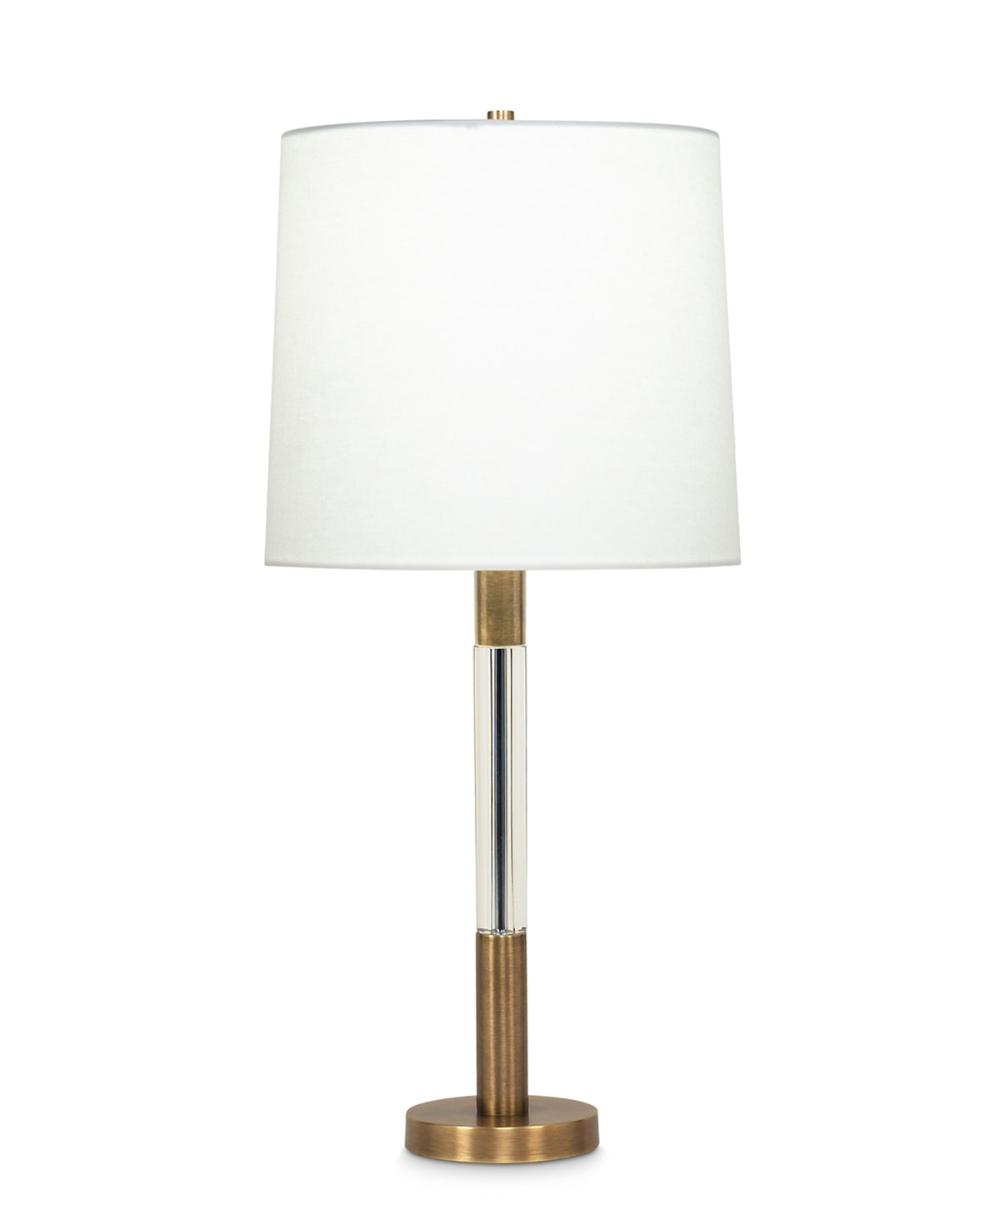 Severn Table Lamp in 2020 Lamp, Table lamp, Floor lamp